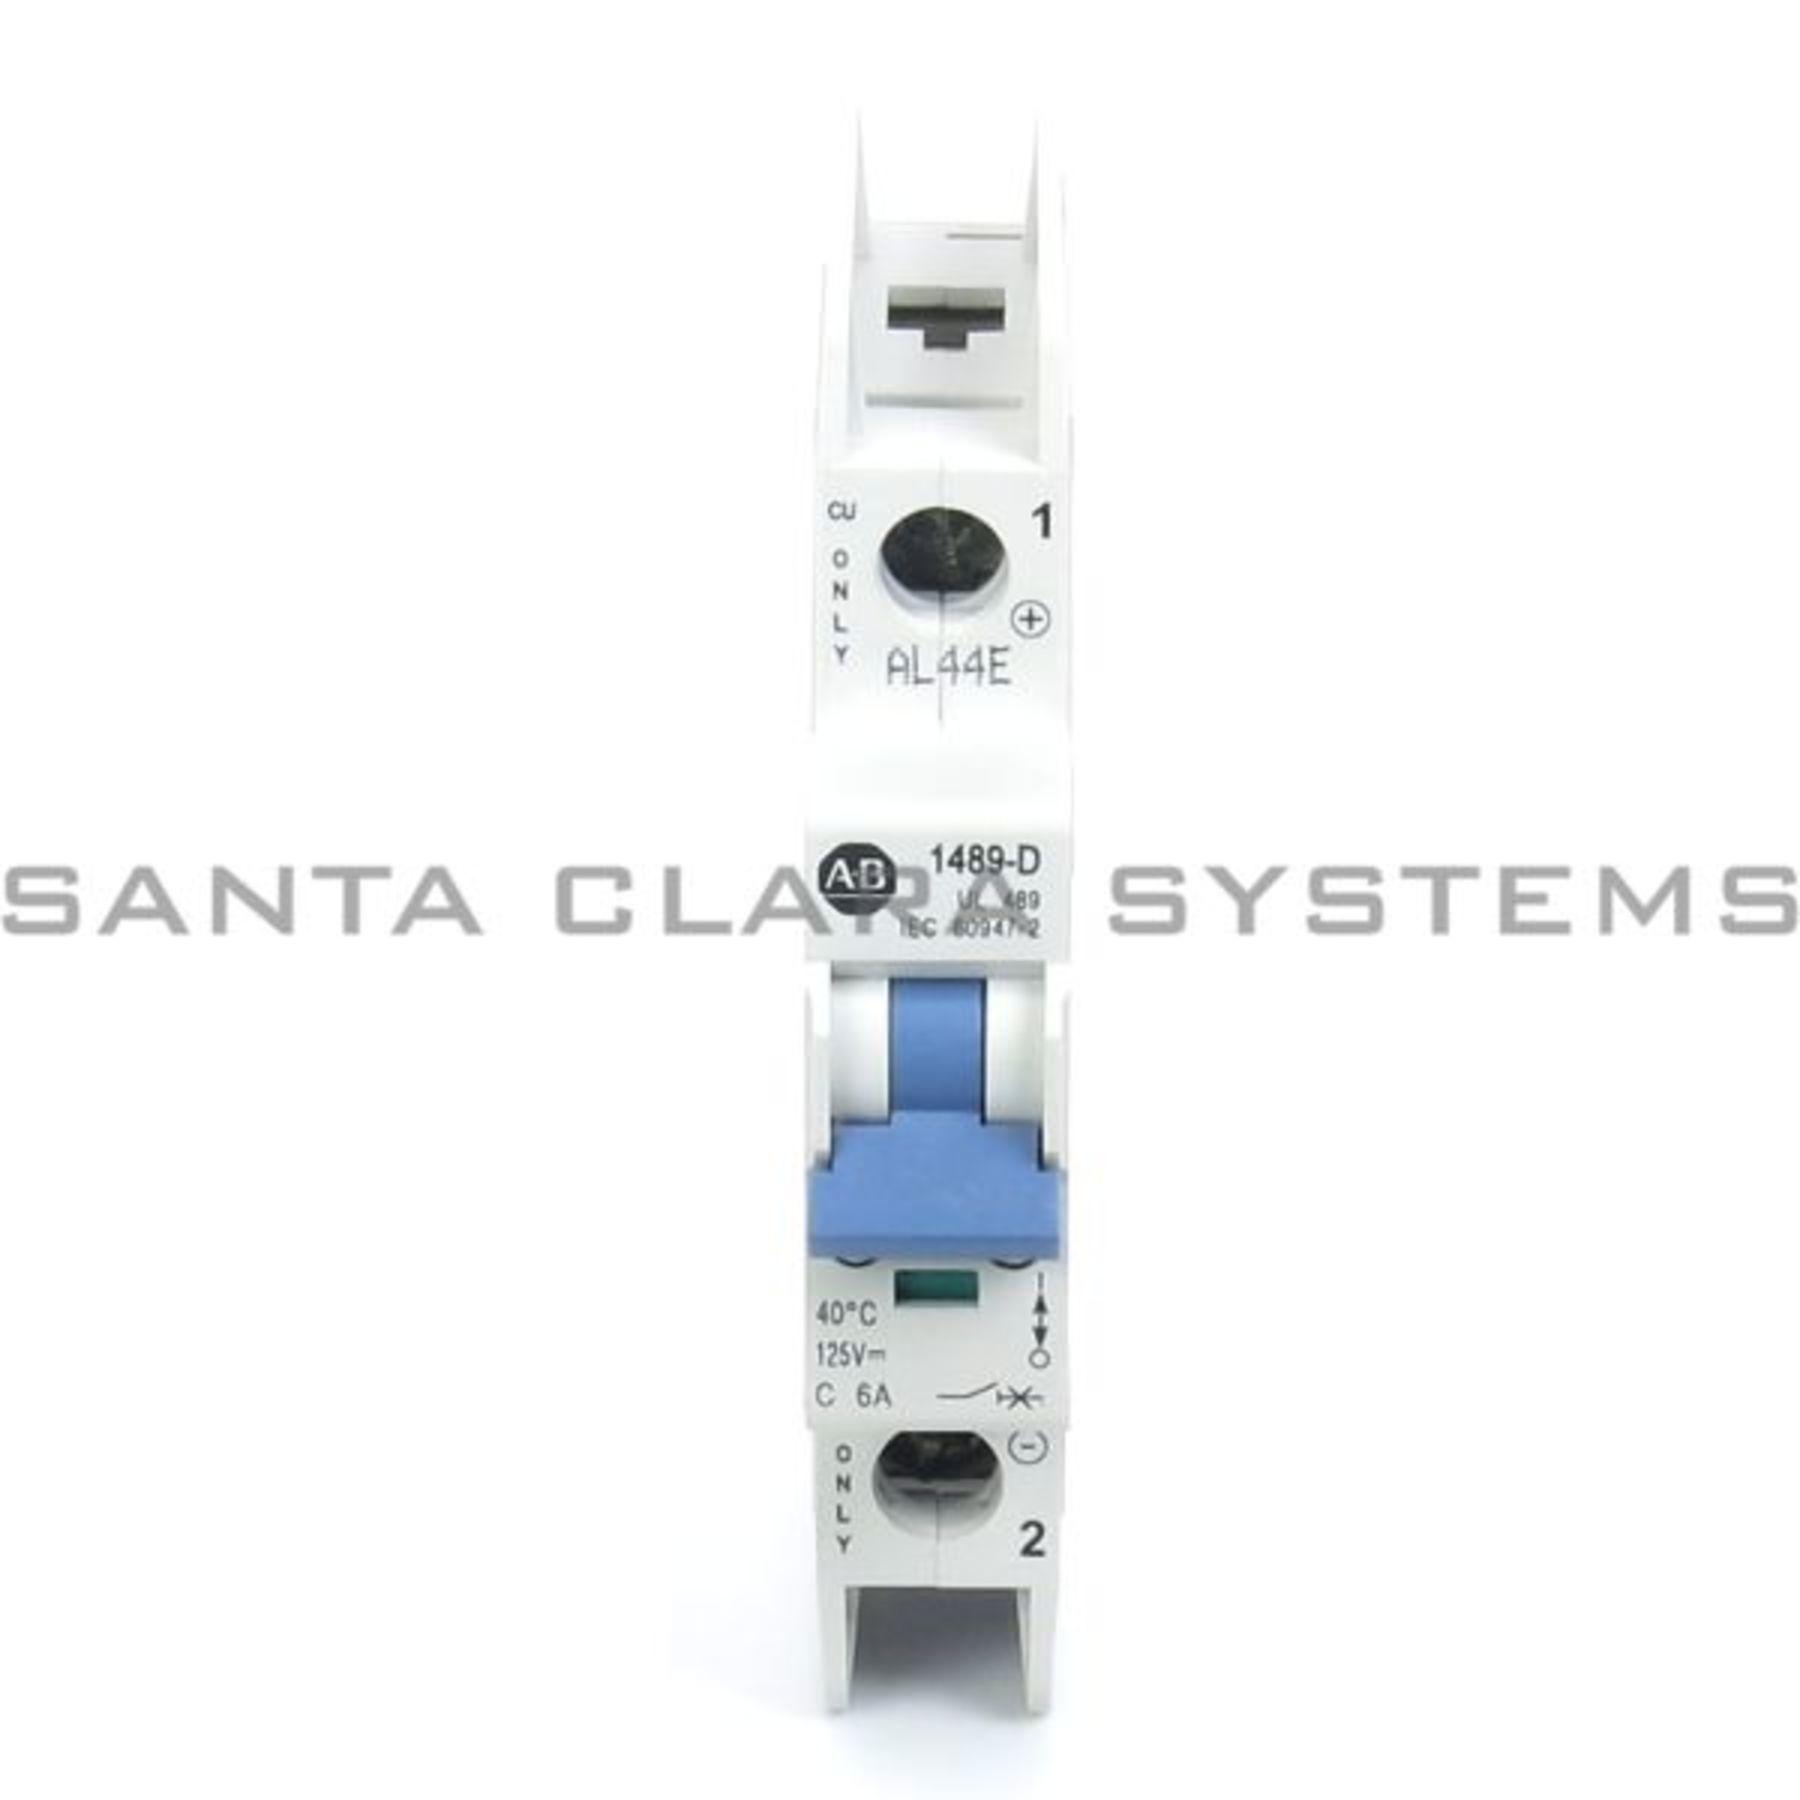 1489 D1c060 Circuit Breaker In Stock Ships Today Santa Clara Systems Portable Allen Bradley Product Image